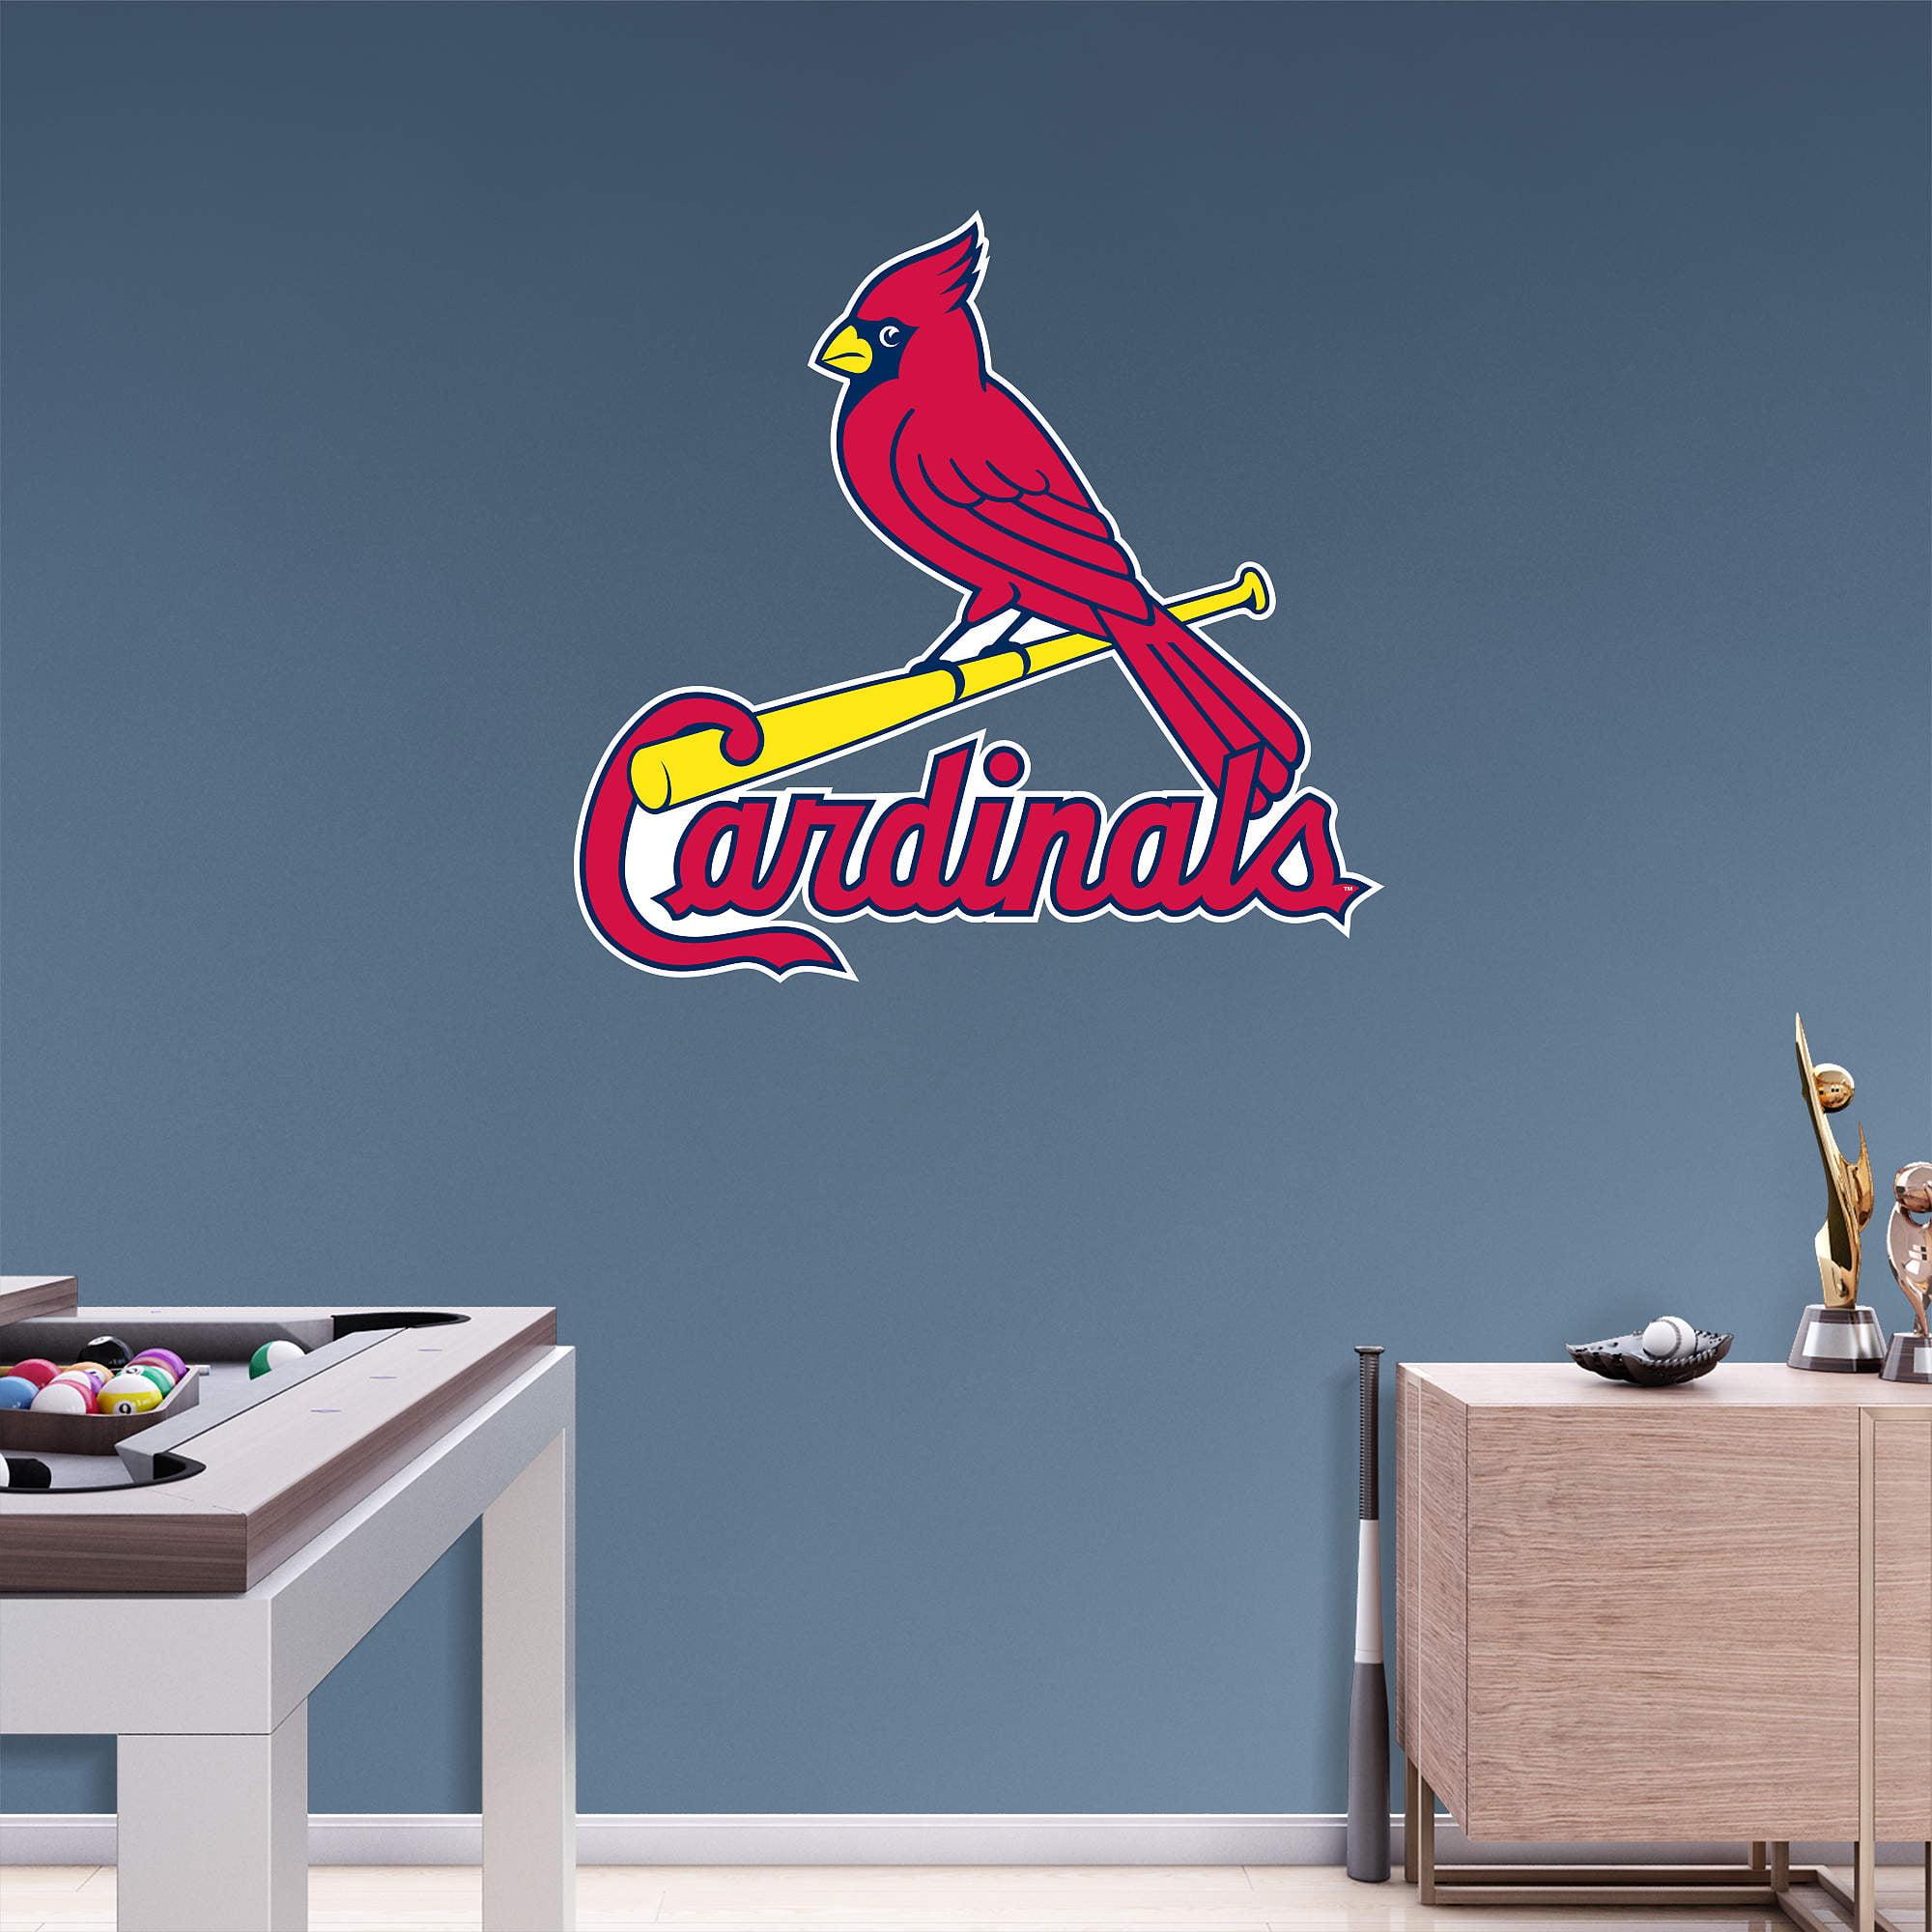 St. Louis Cardinals Fathead Team Logo Wall Decal - No Size